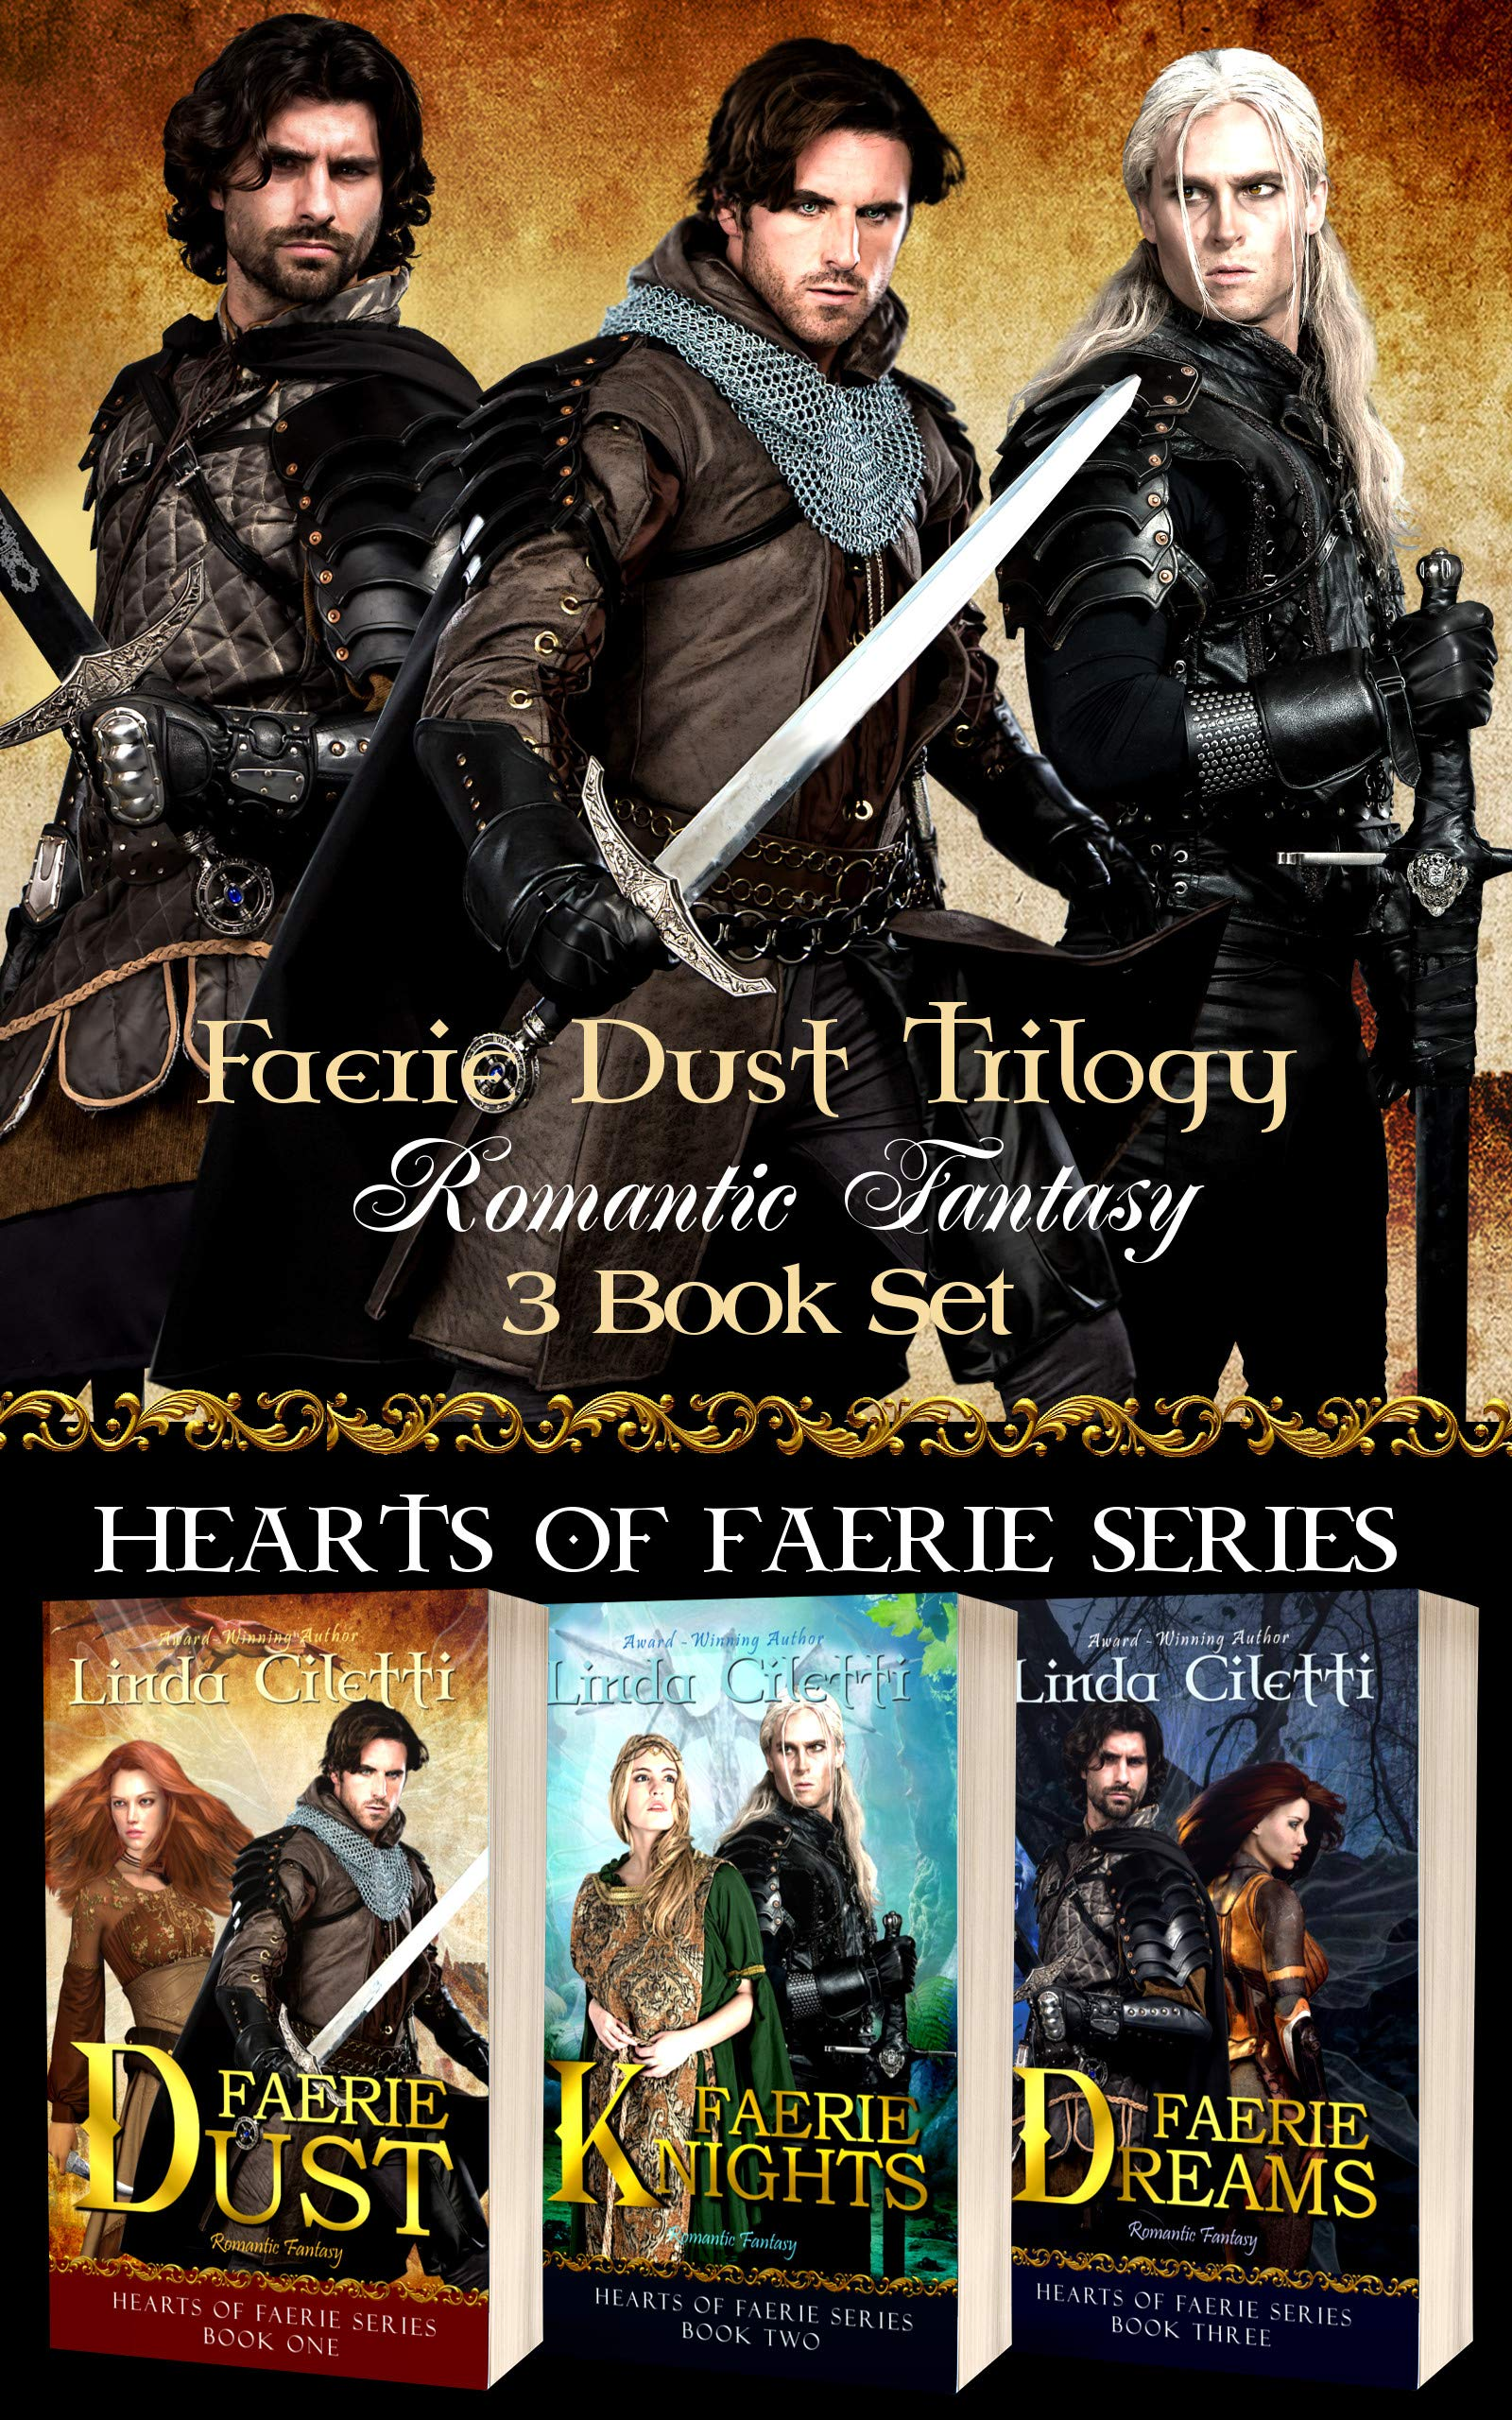 Faerie Dust Trilogy: Fantasy Romance 3 Book Set (Hearts of Faerie Series)